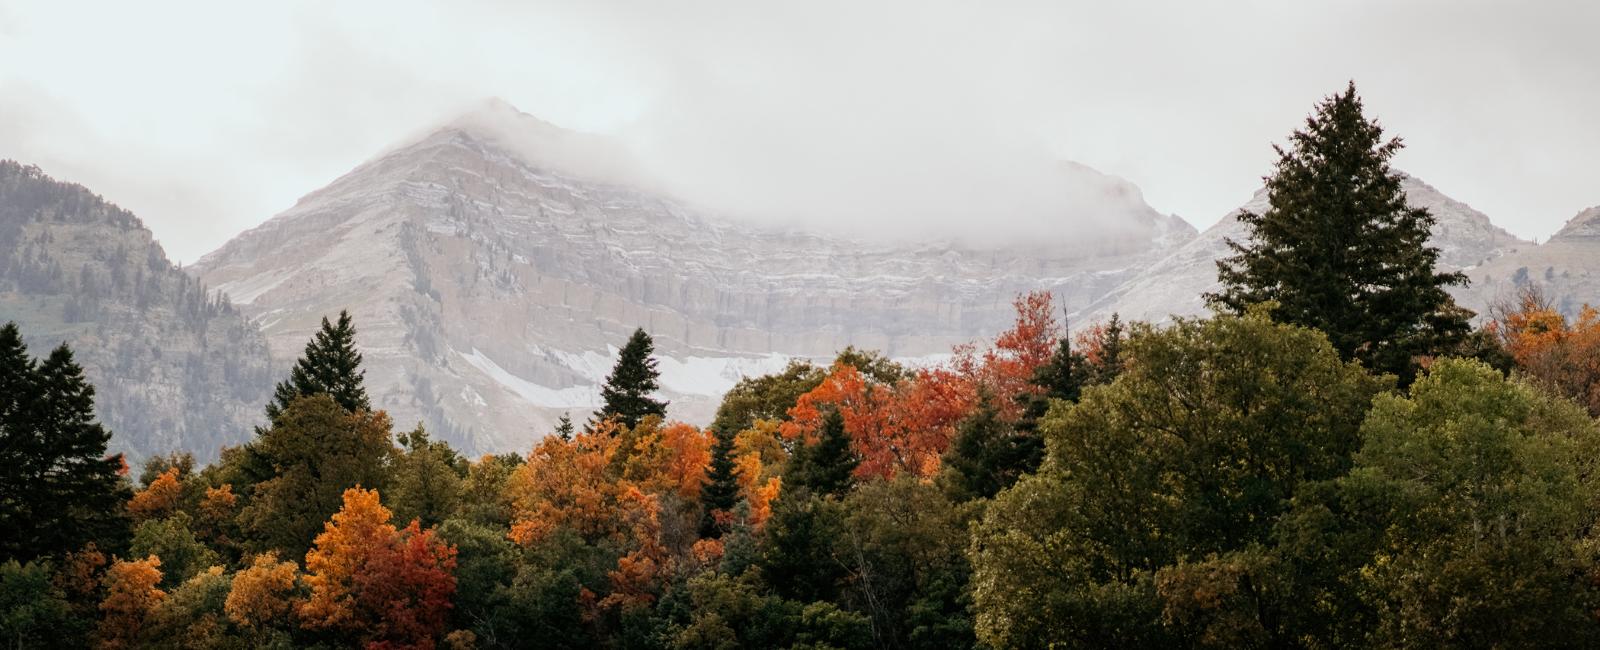 Sundance Now & Then: A Haven for Culture & Natural Splendor